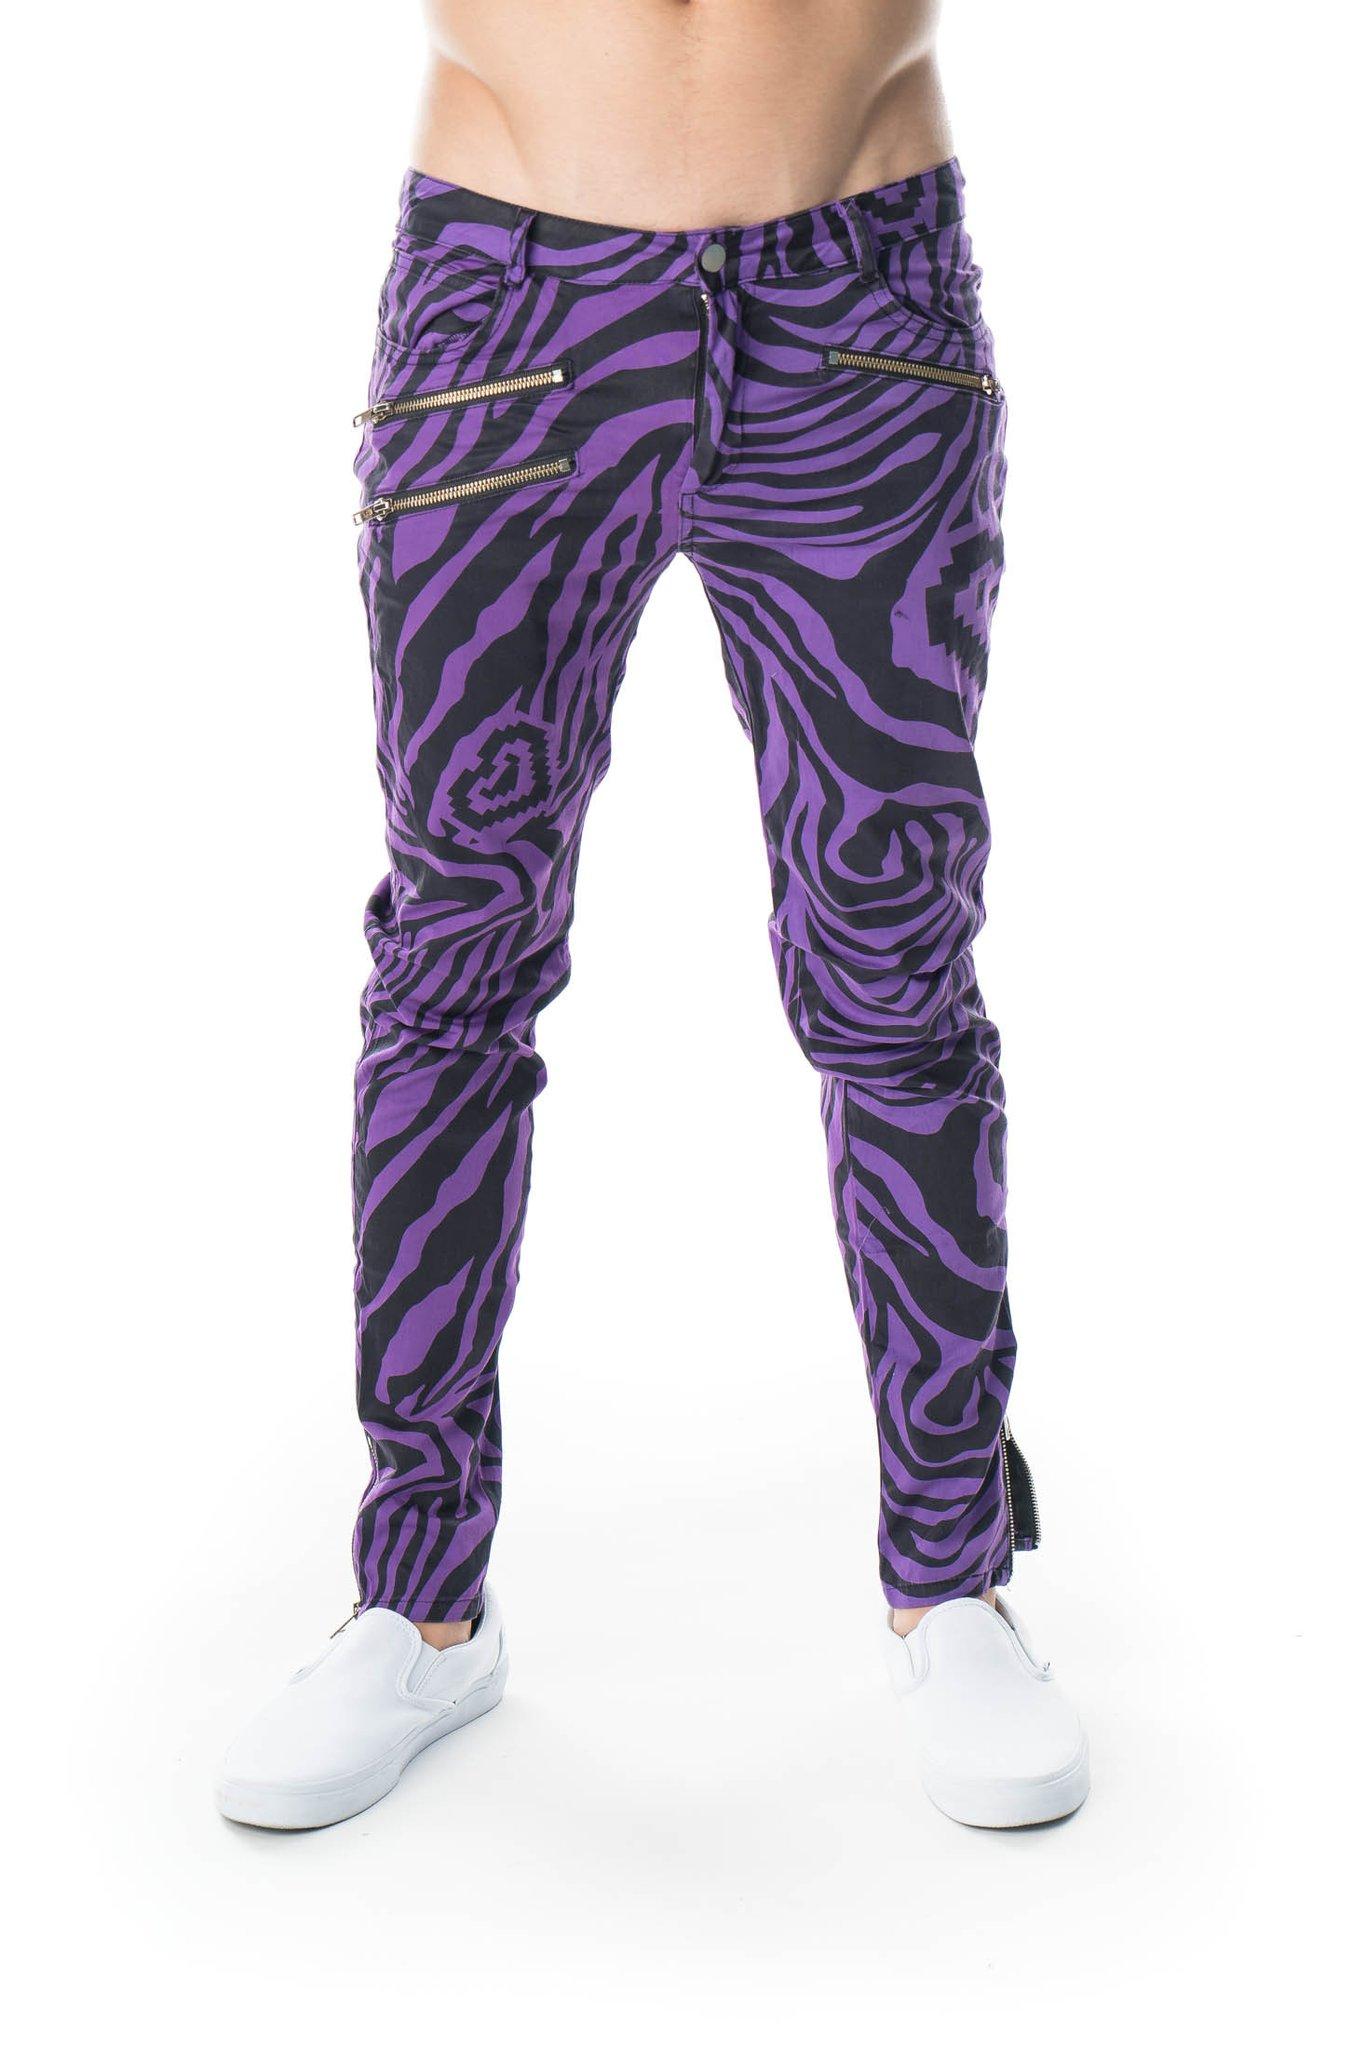 Party Rock Clothing★パーティーロッククロッシング ★La Freak Zebra Pants (パープル)